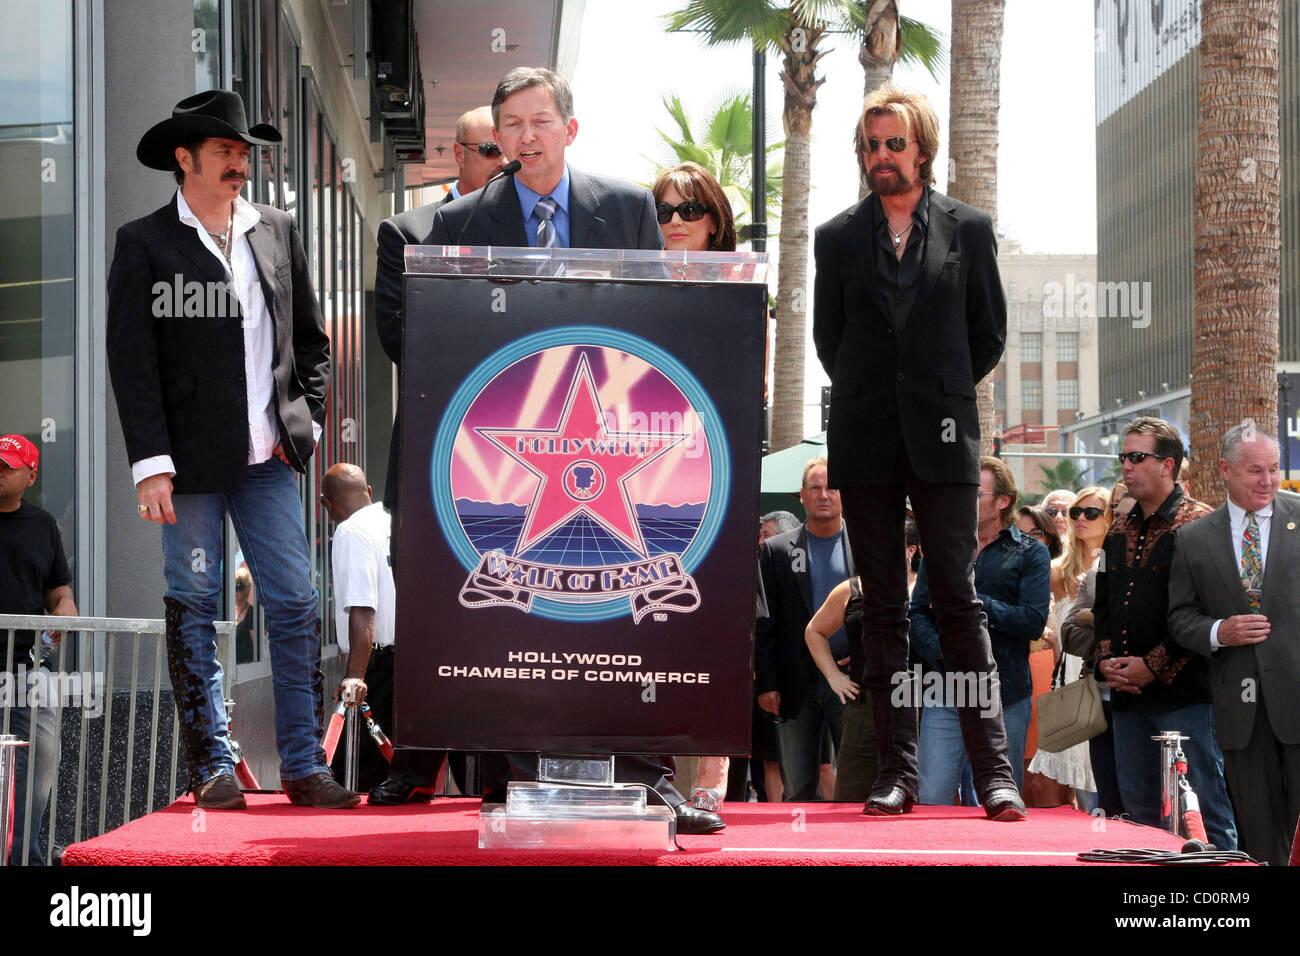 Aug. 4, 2008 - Hollywood, California, U.S. - I13427CHW.AWARD-WINNING U.S. RECORDING ARTISTS BROOKS & DUNN HONORED - Stock Image